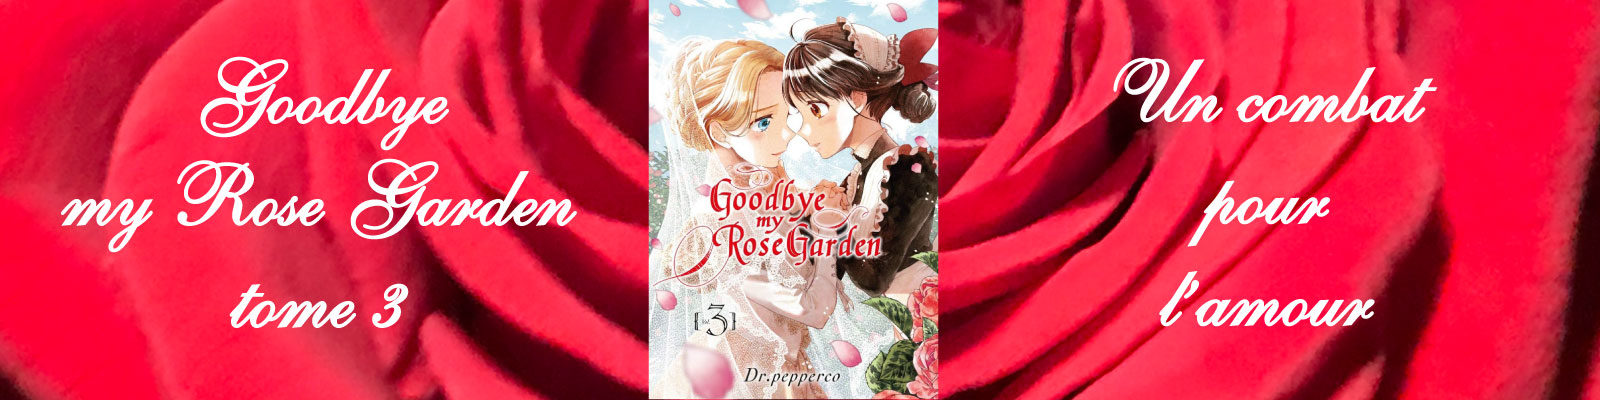 Goodbye my Rose Garden-Vol.-3-FIN